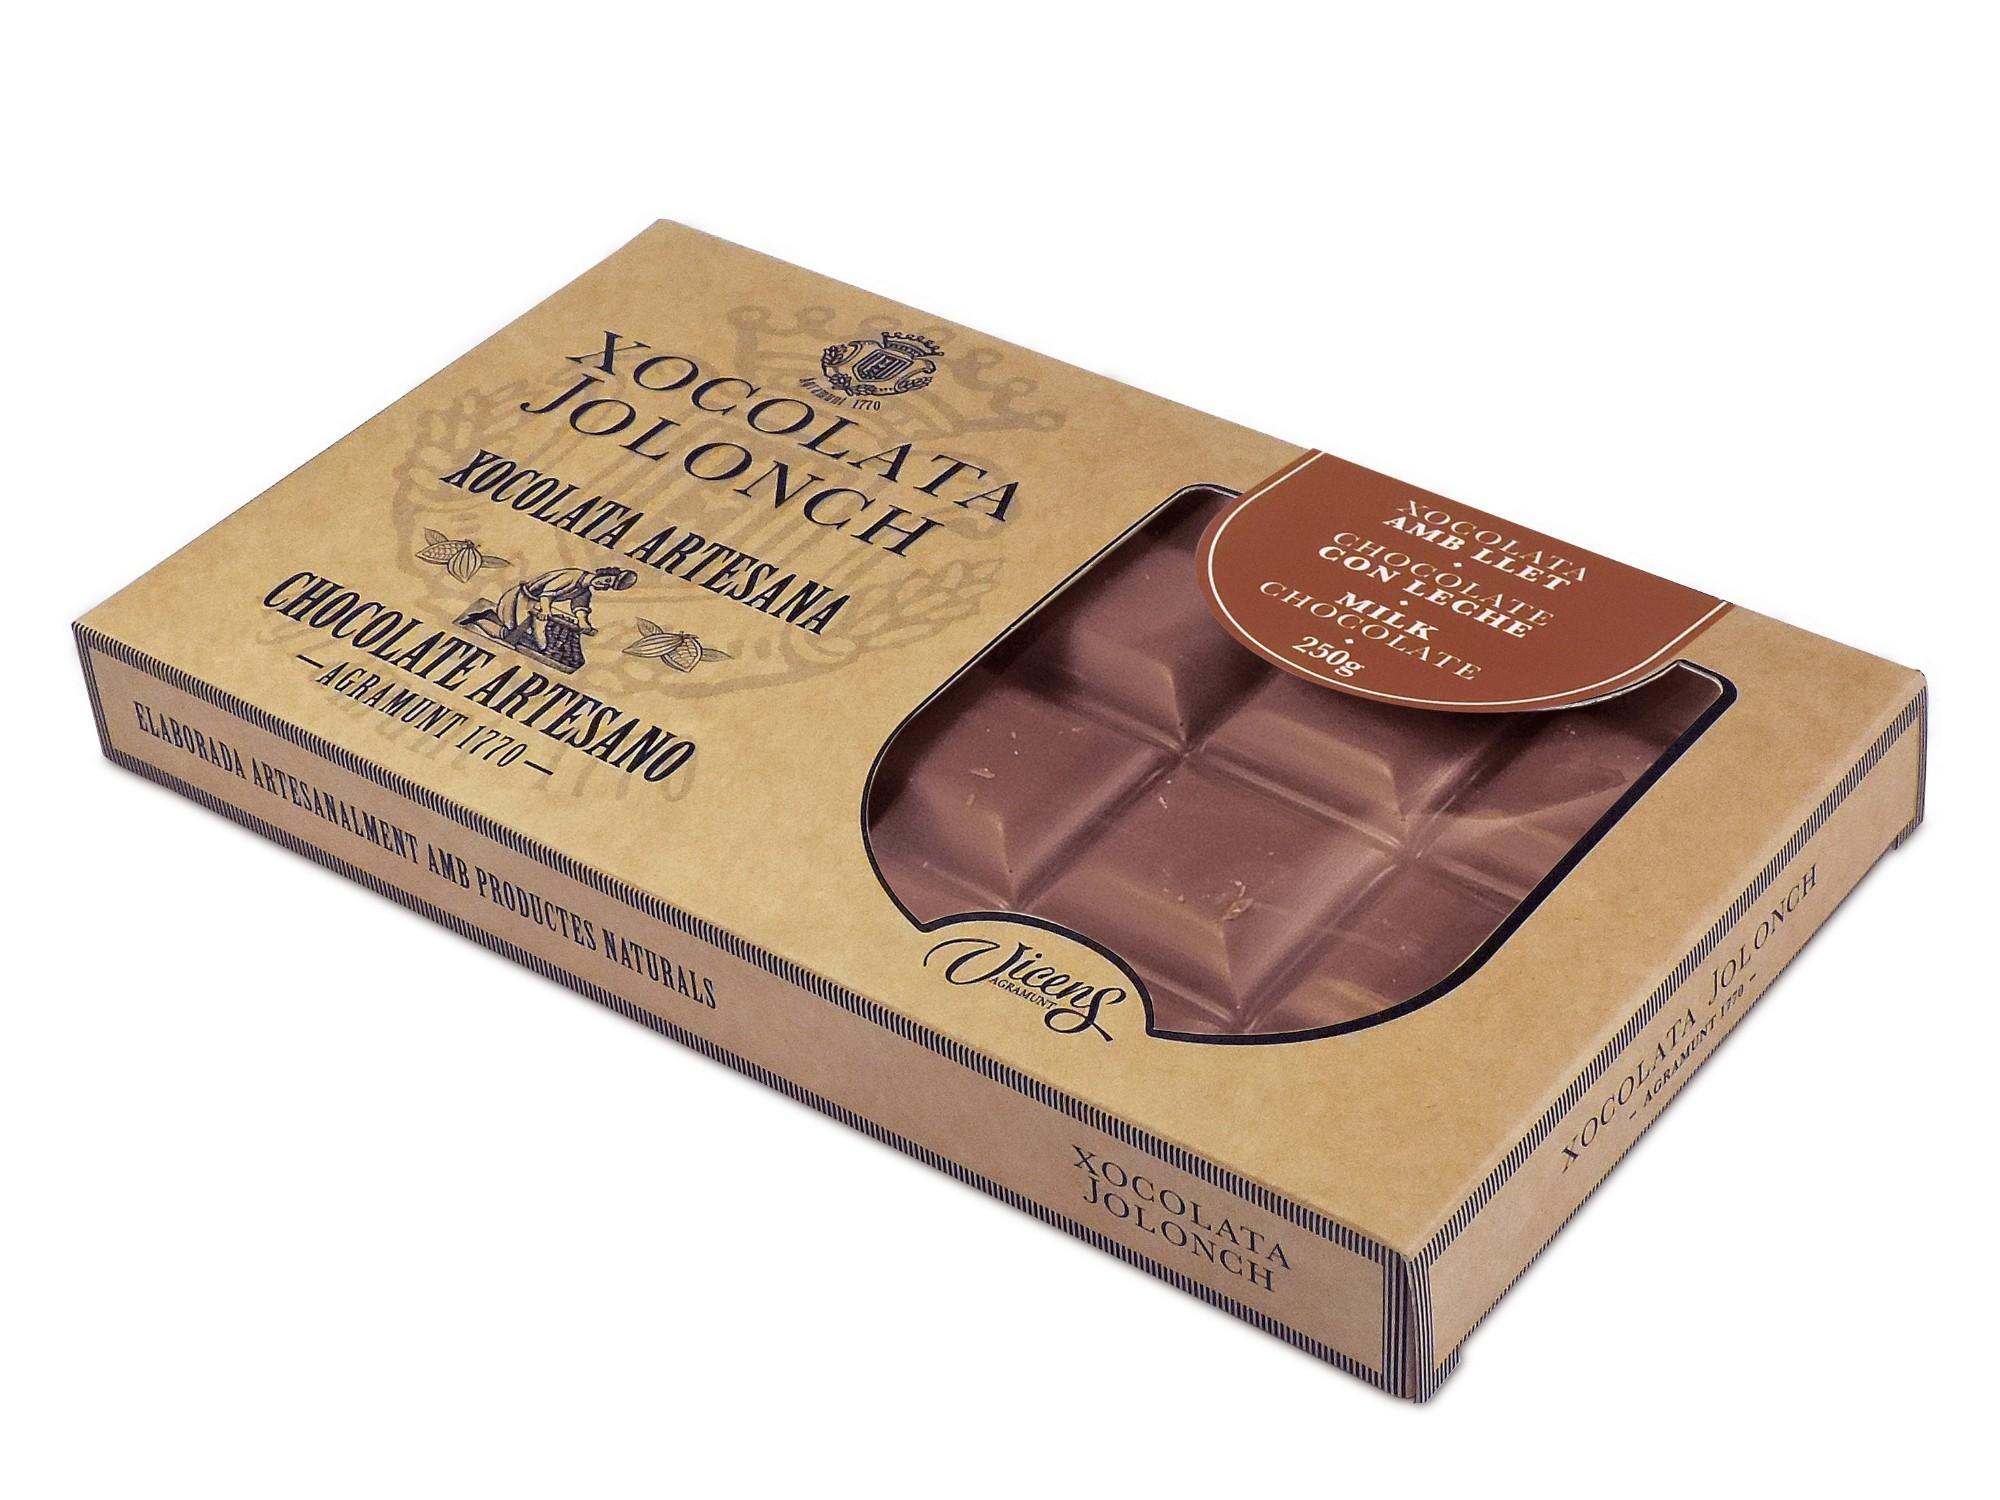 Pieninis šokoladas JOLONCH, 200g